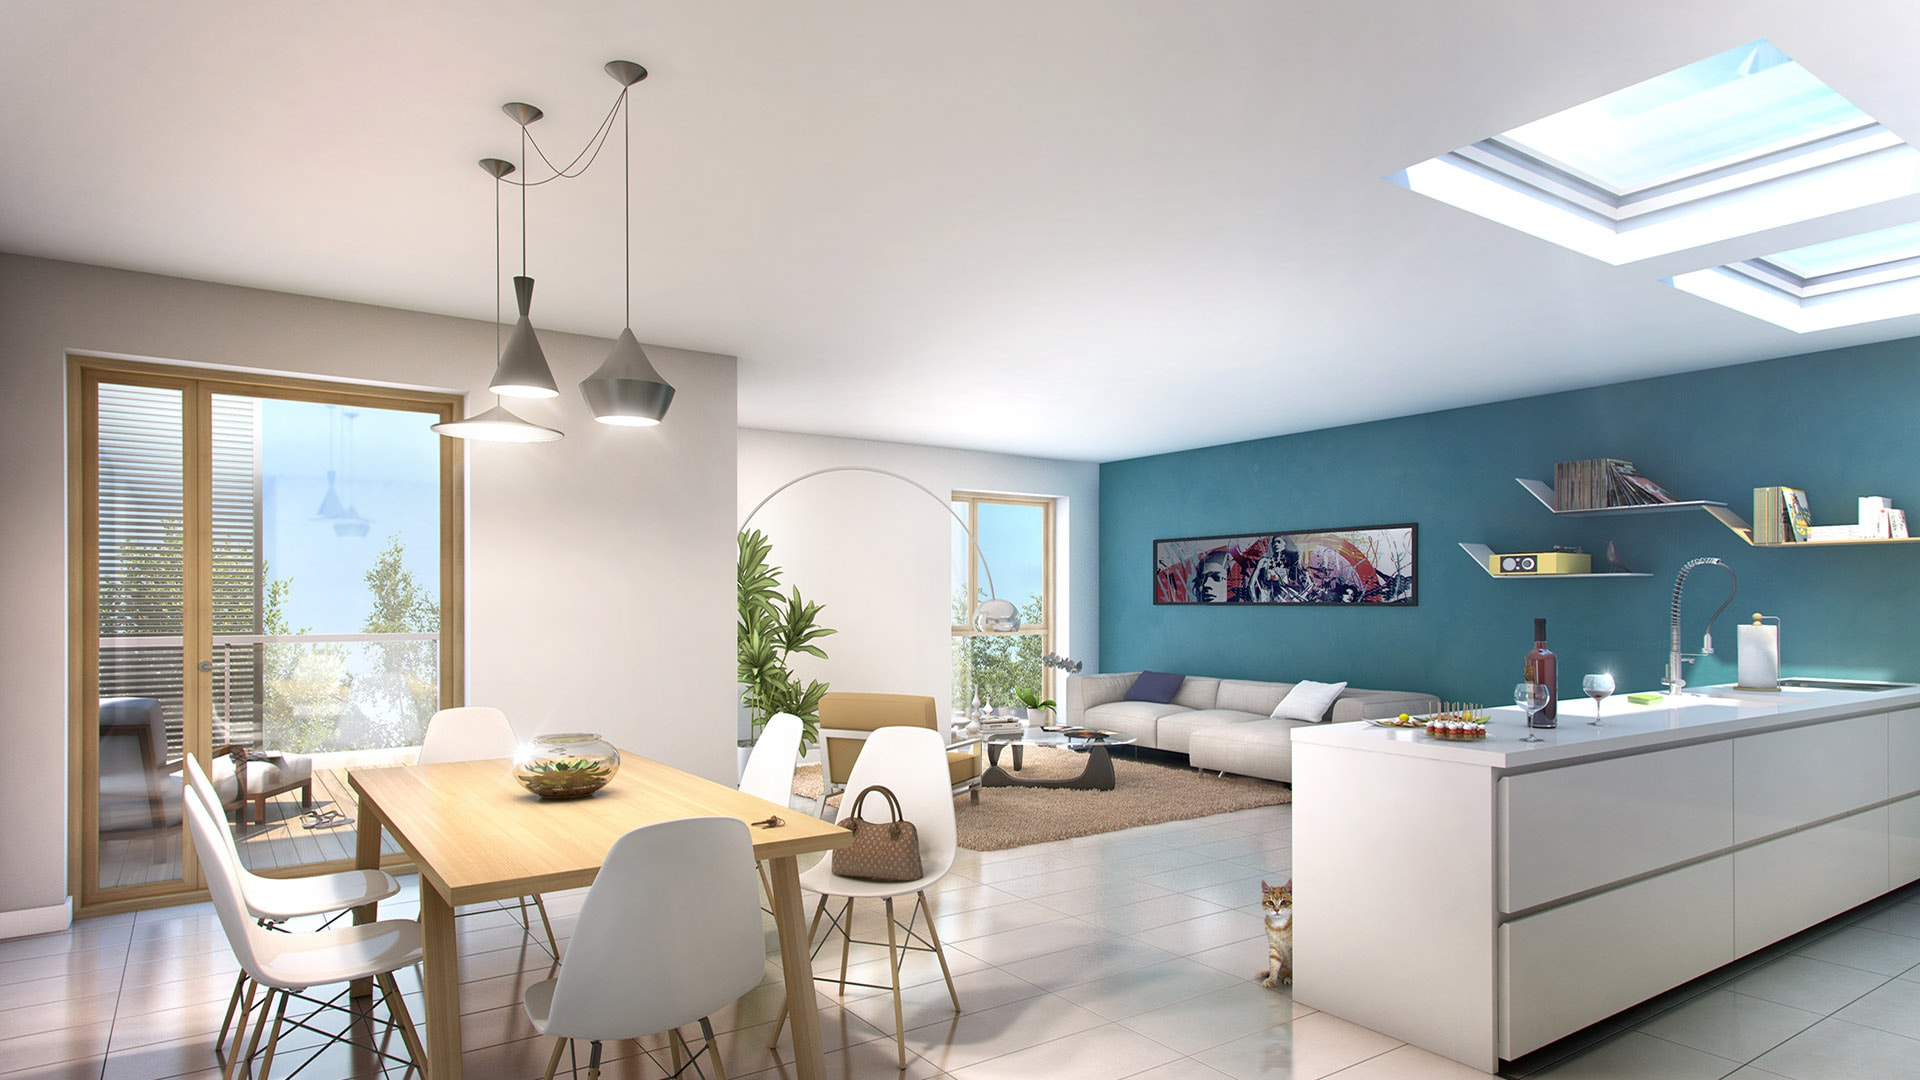 https://media.habiteo.com/images/residence_new/280/perspective-interieur-d-un-appartement-5-pieces-de-la-residence-appartements-lux-situee-a-lyon.jpg?v=2